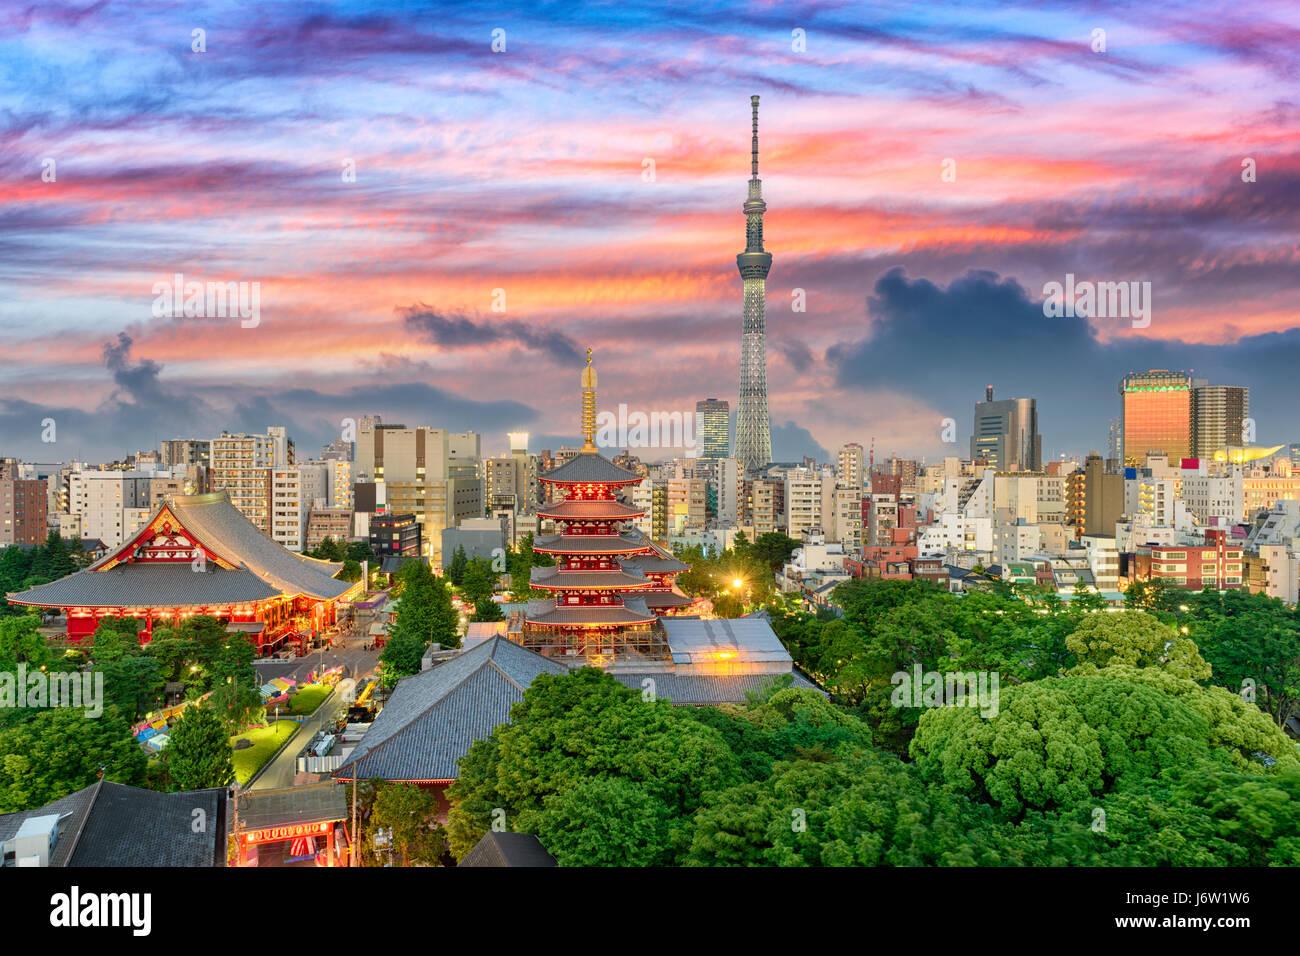 Tokyo, Japan am Sensoji und Skytree Turm. Stockbild